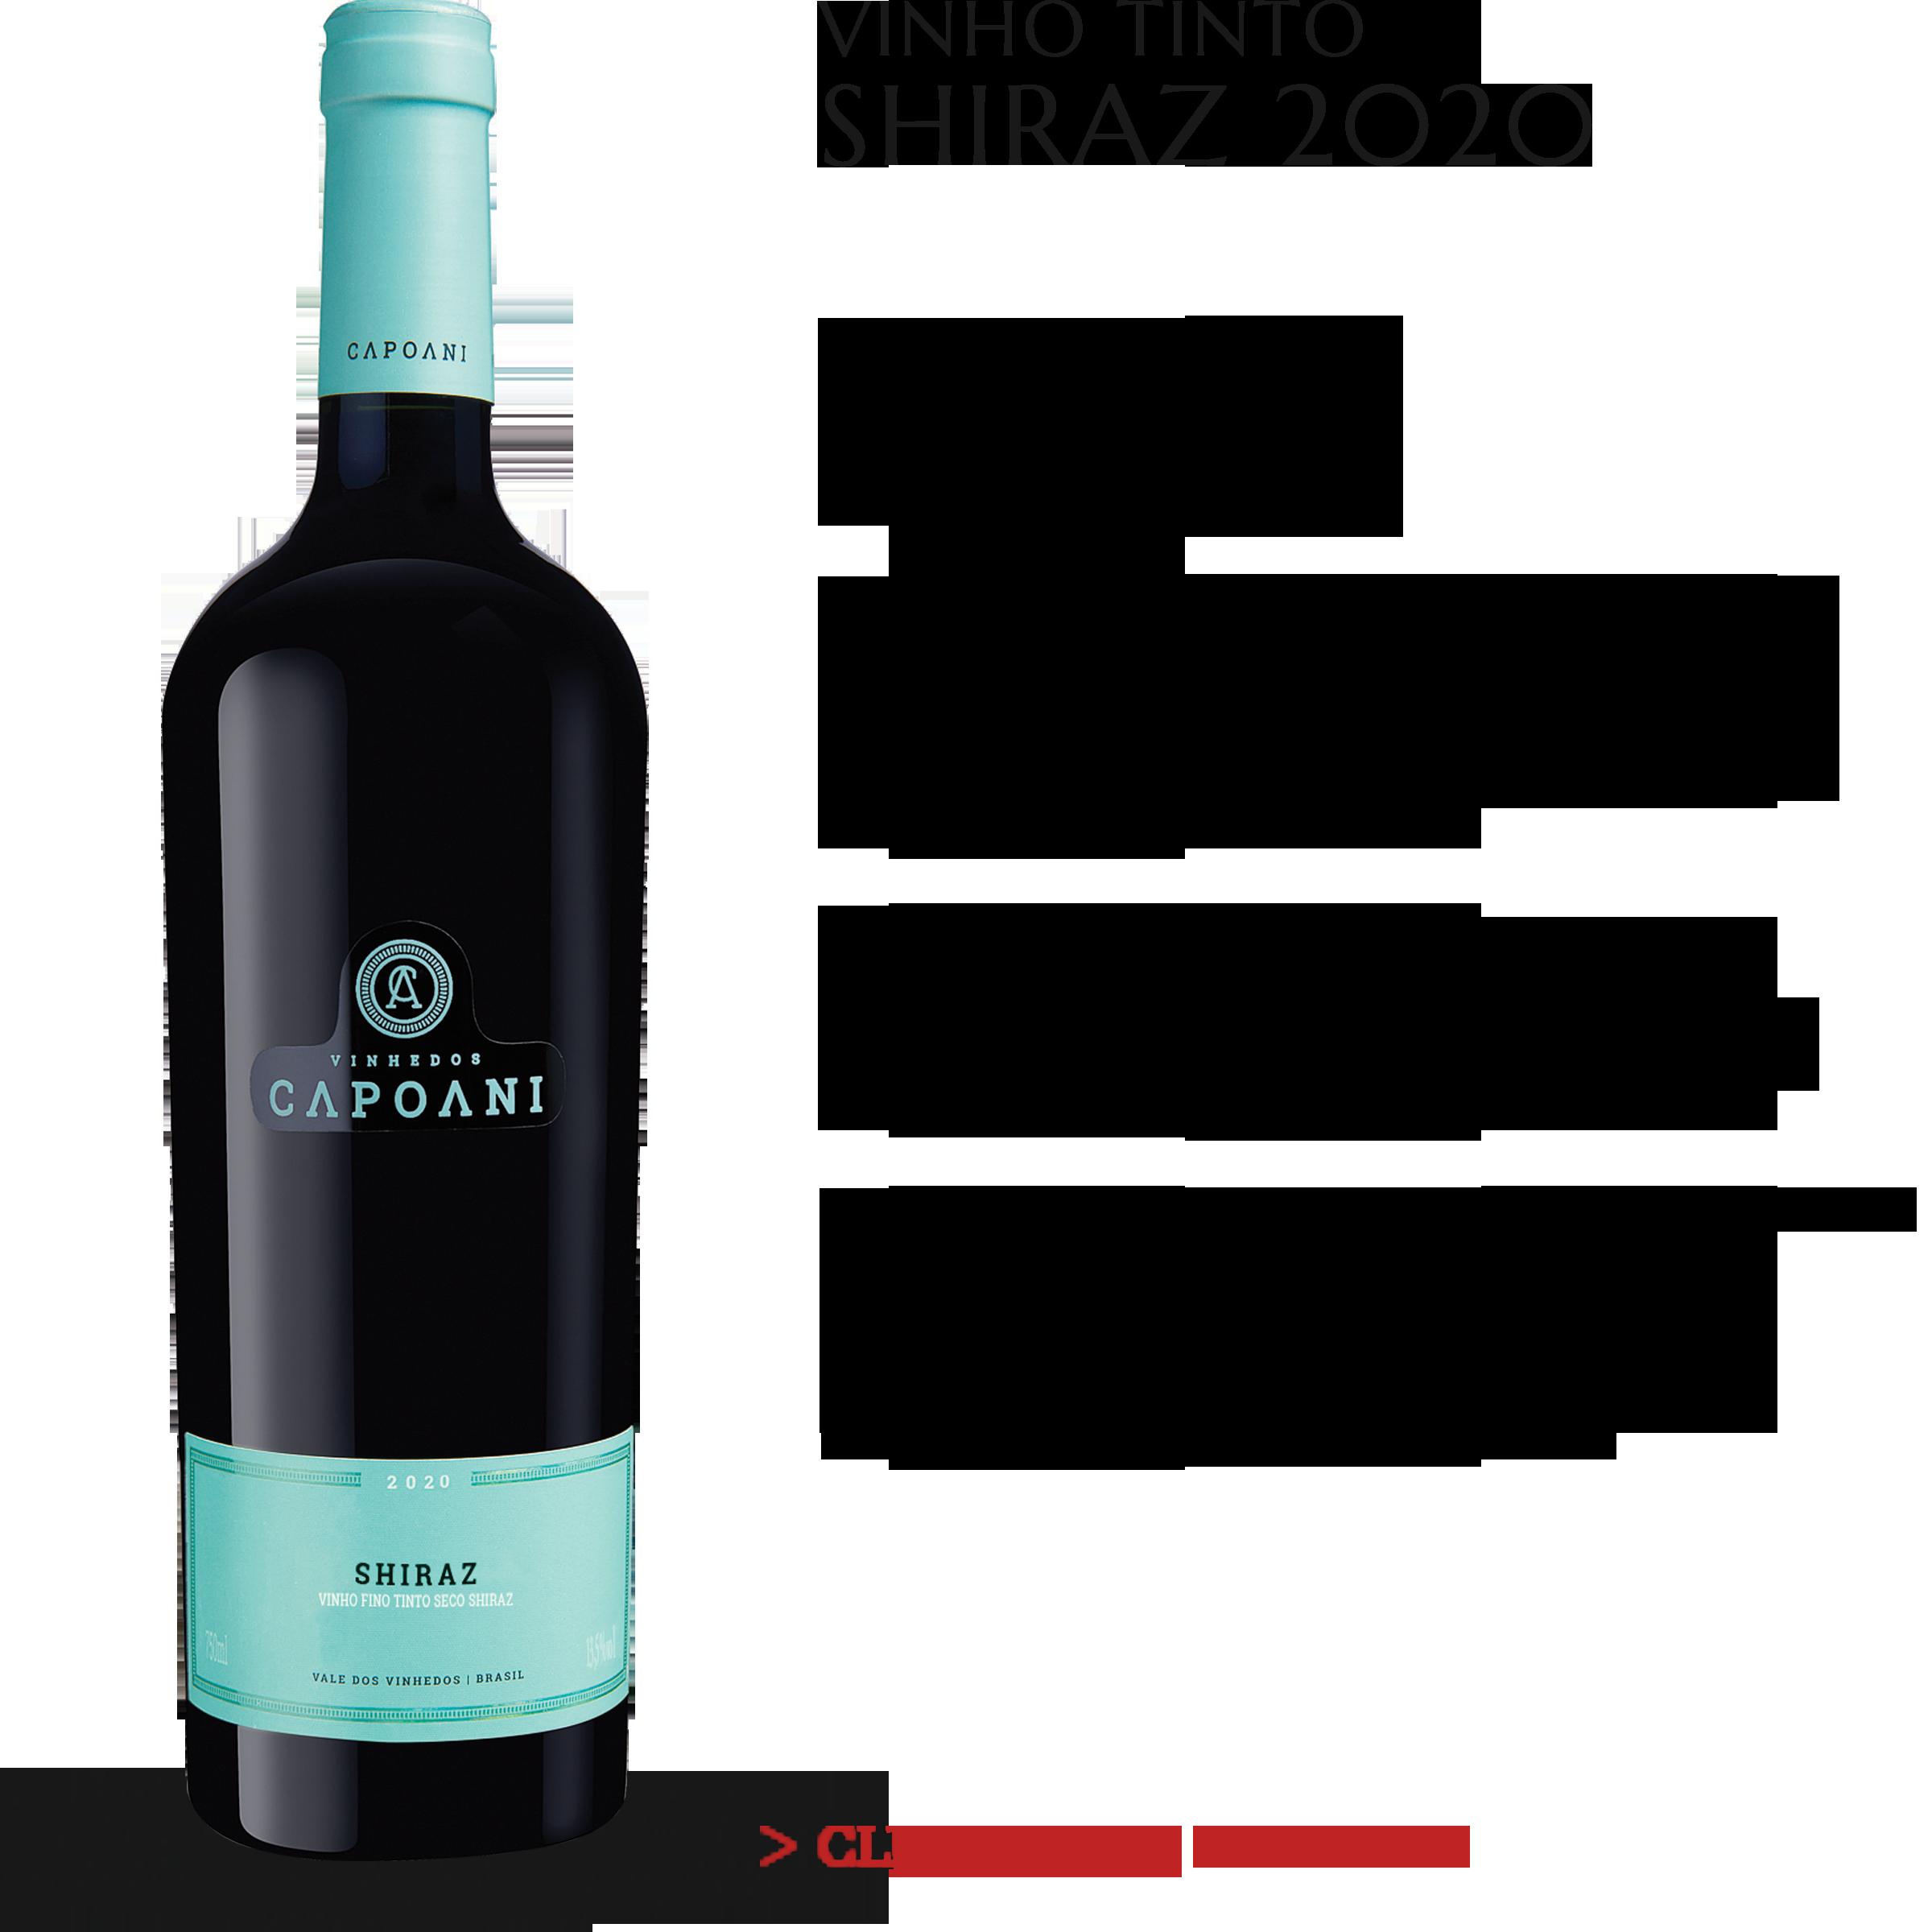 Vinho Tinto Shiraz 2020